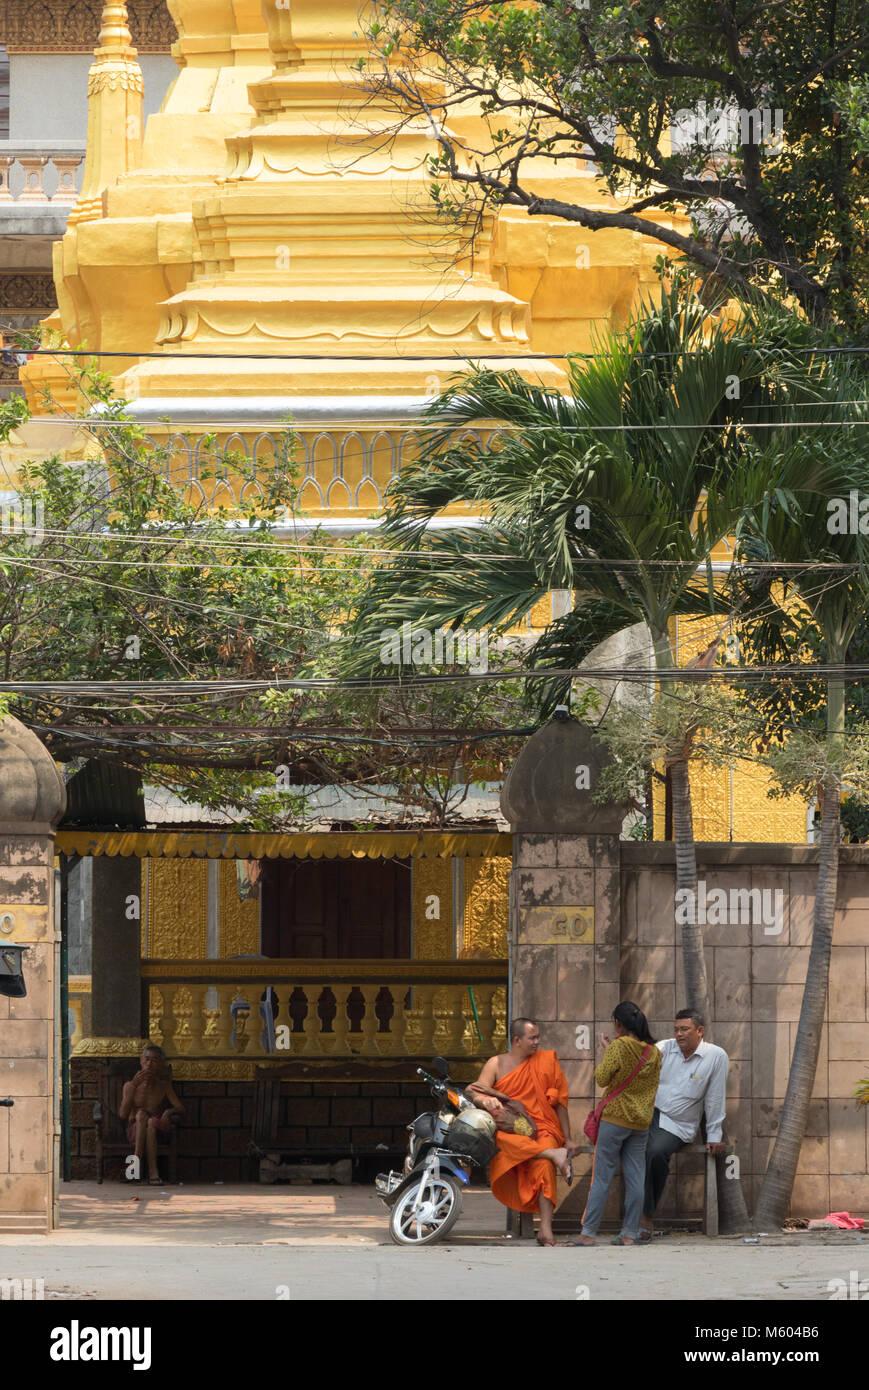 Phnom Penh Kambodscha - Straßenszene mit buddhistischer Mönch und Tempel, Phnom Penh, Kambodscha Asien Stockbild